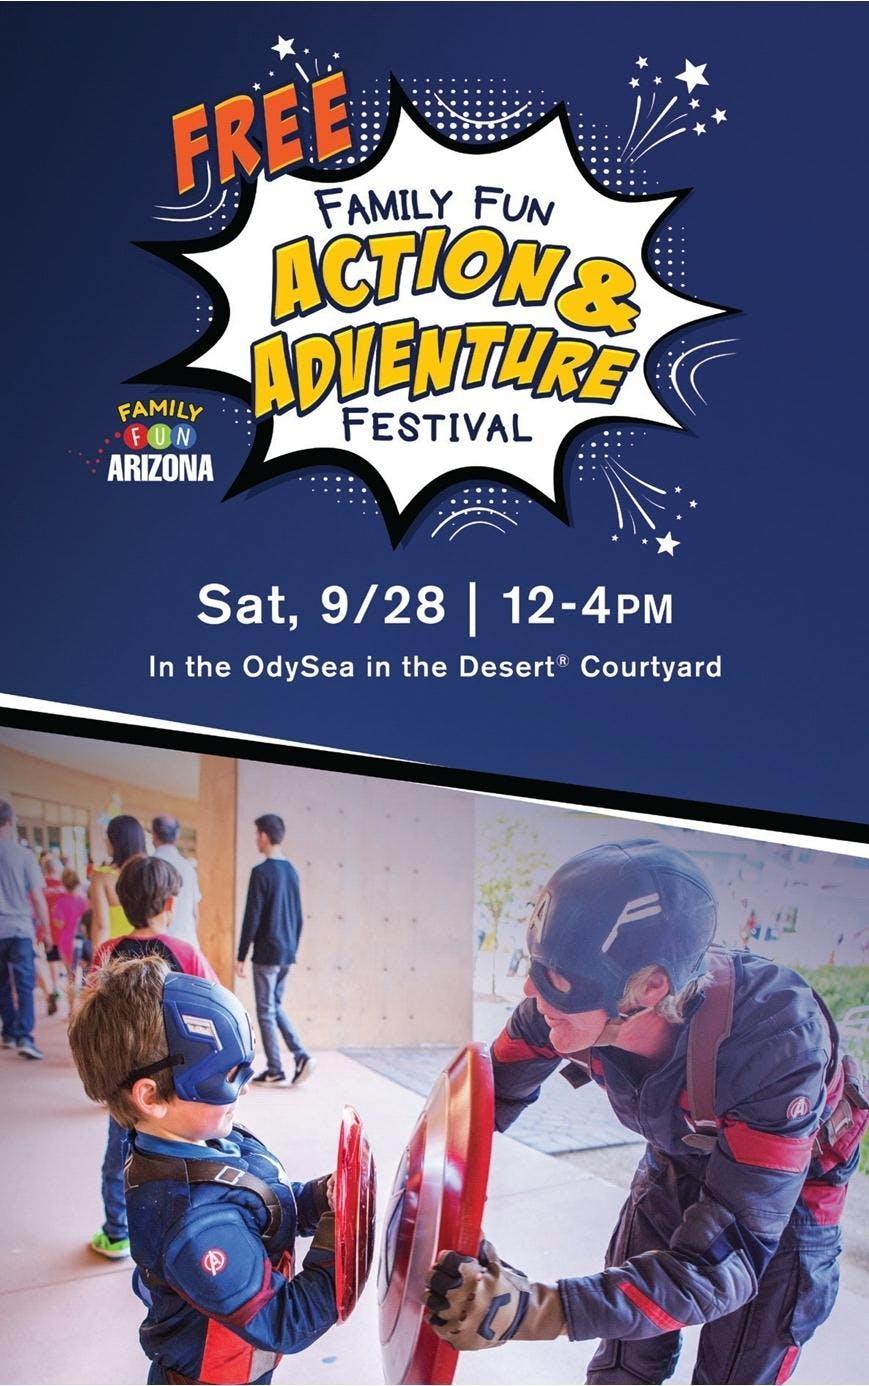 Annual Family Fun ACTION & ADVENTURE Festival!